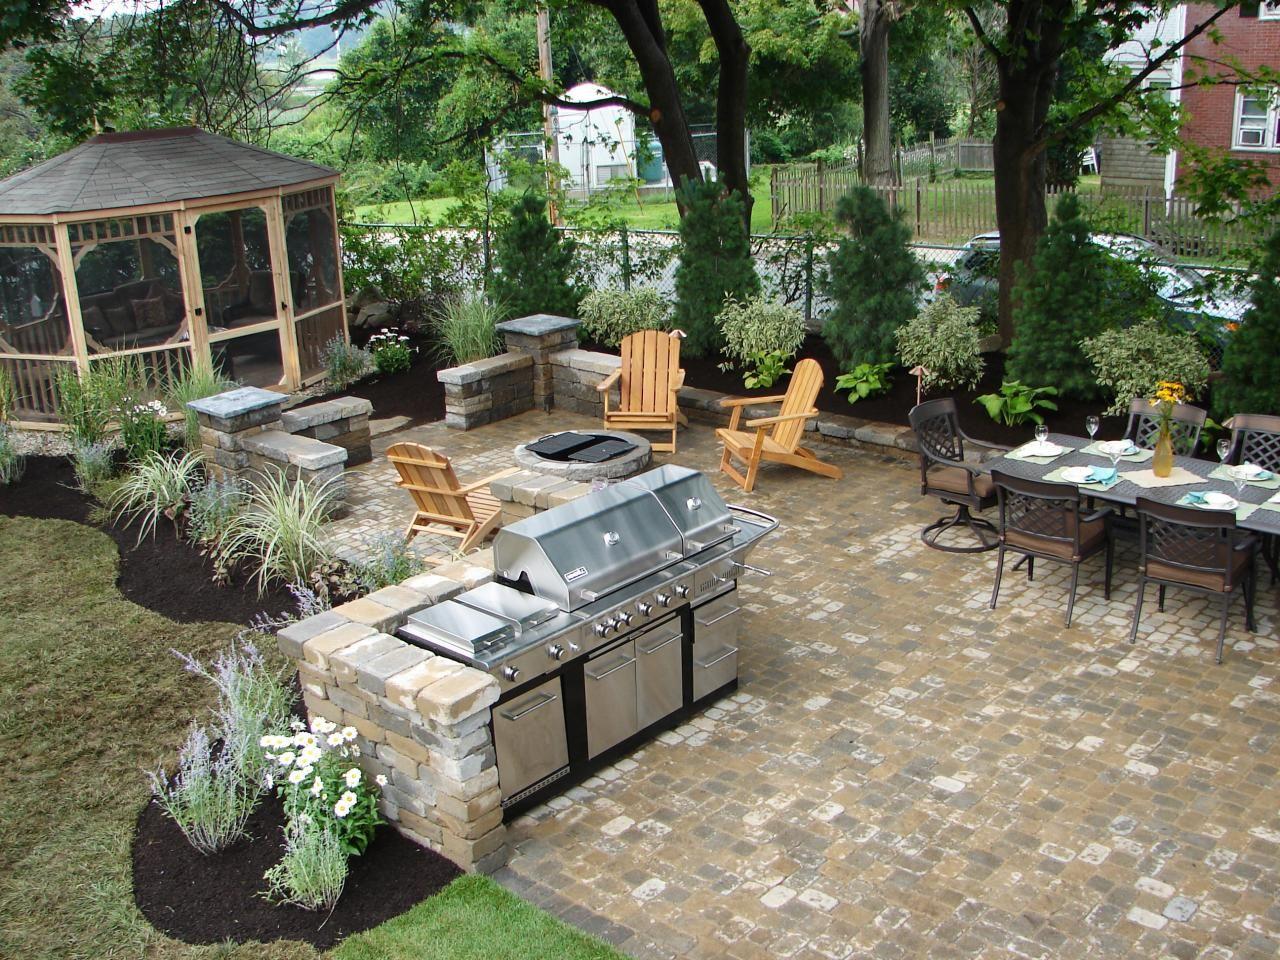 Pictures Of Outdoor Kitchen Design Ideas U0026 Inspiration